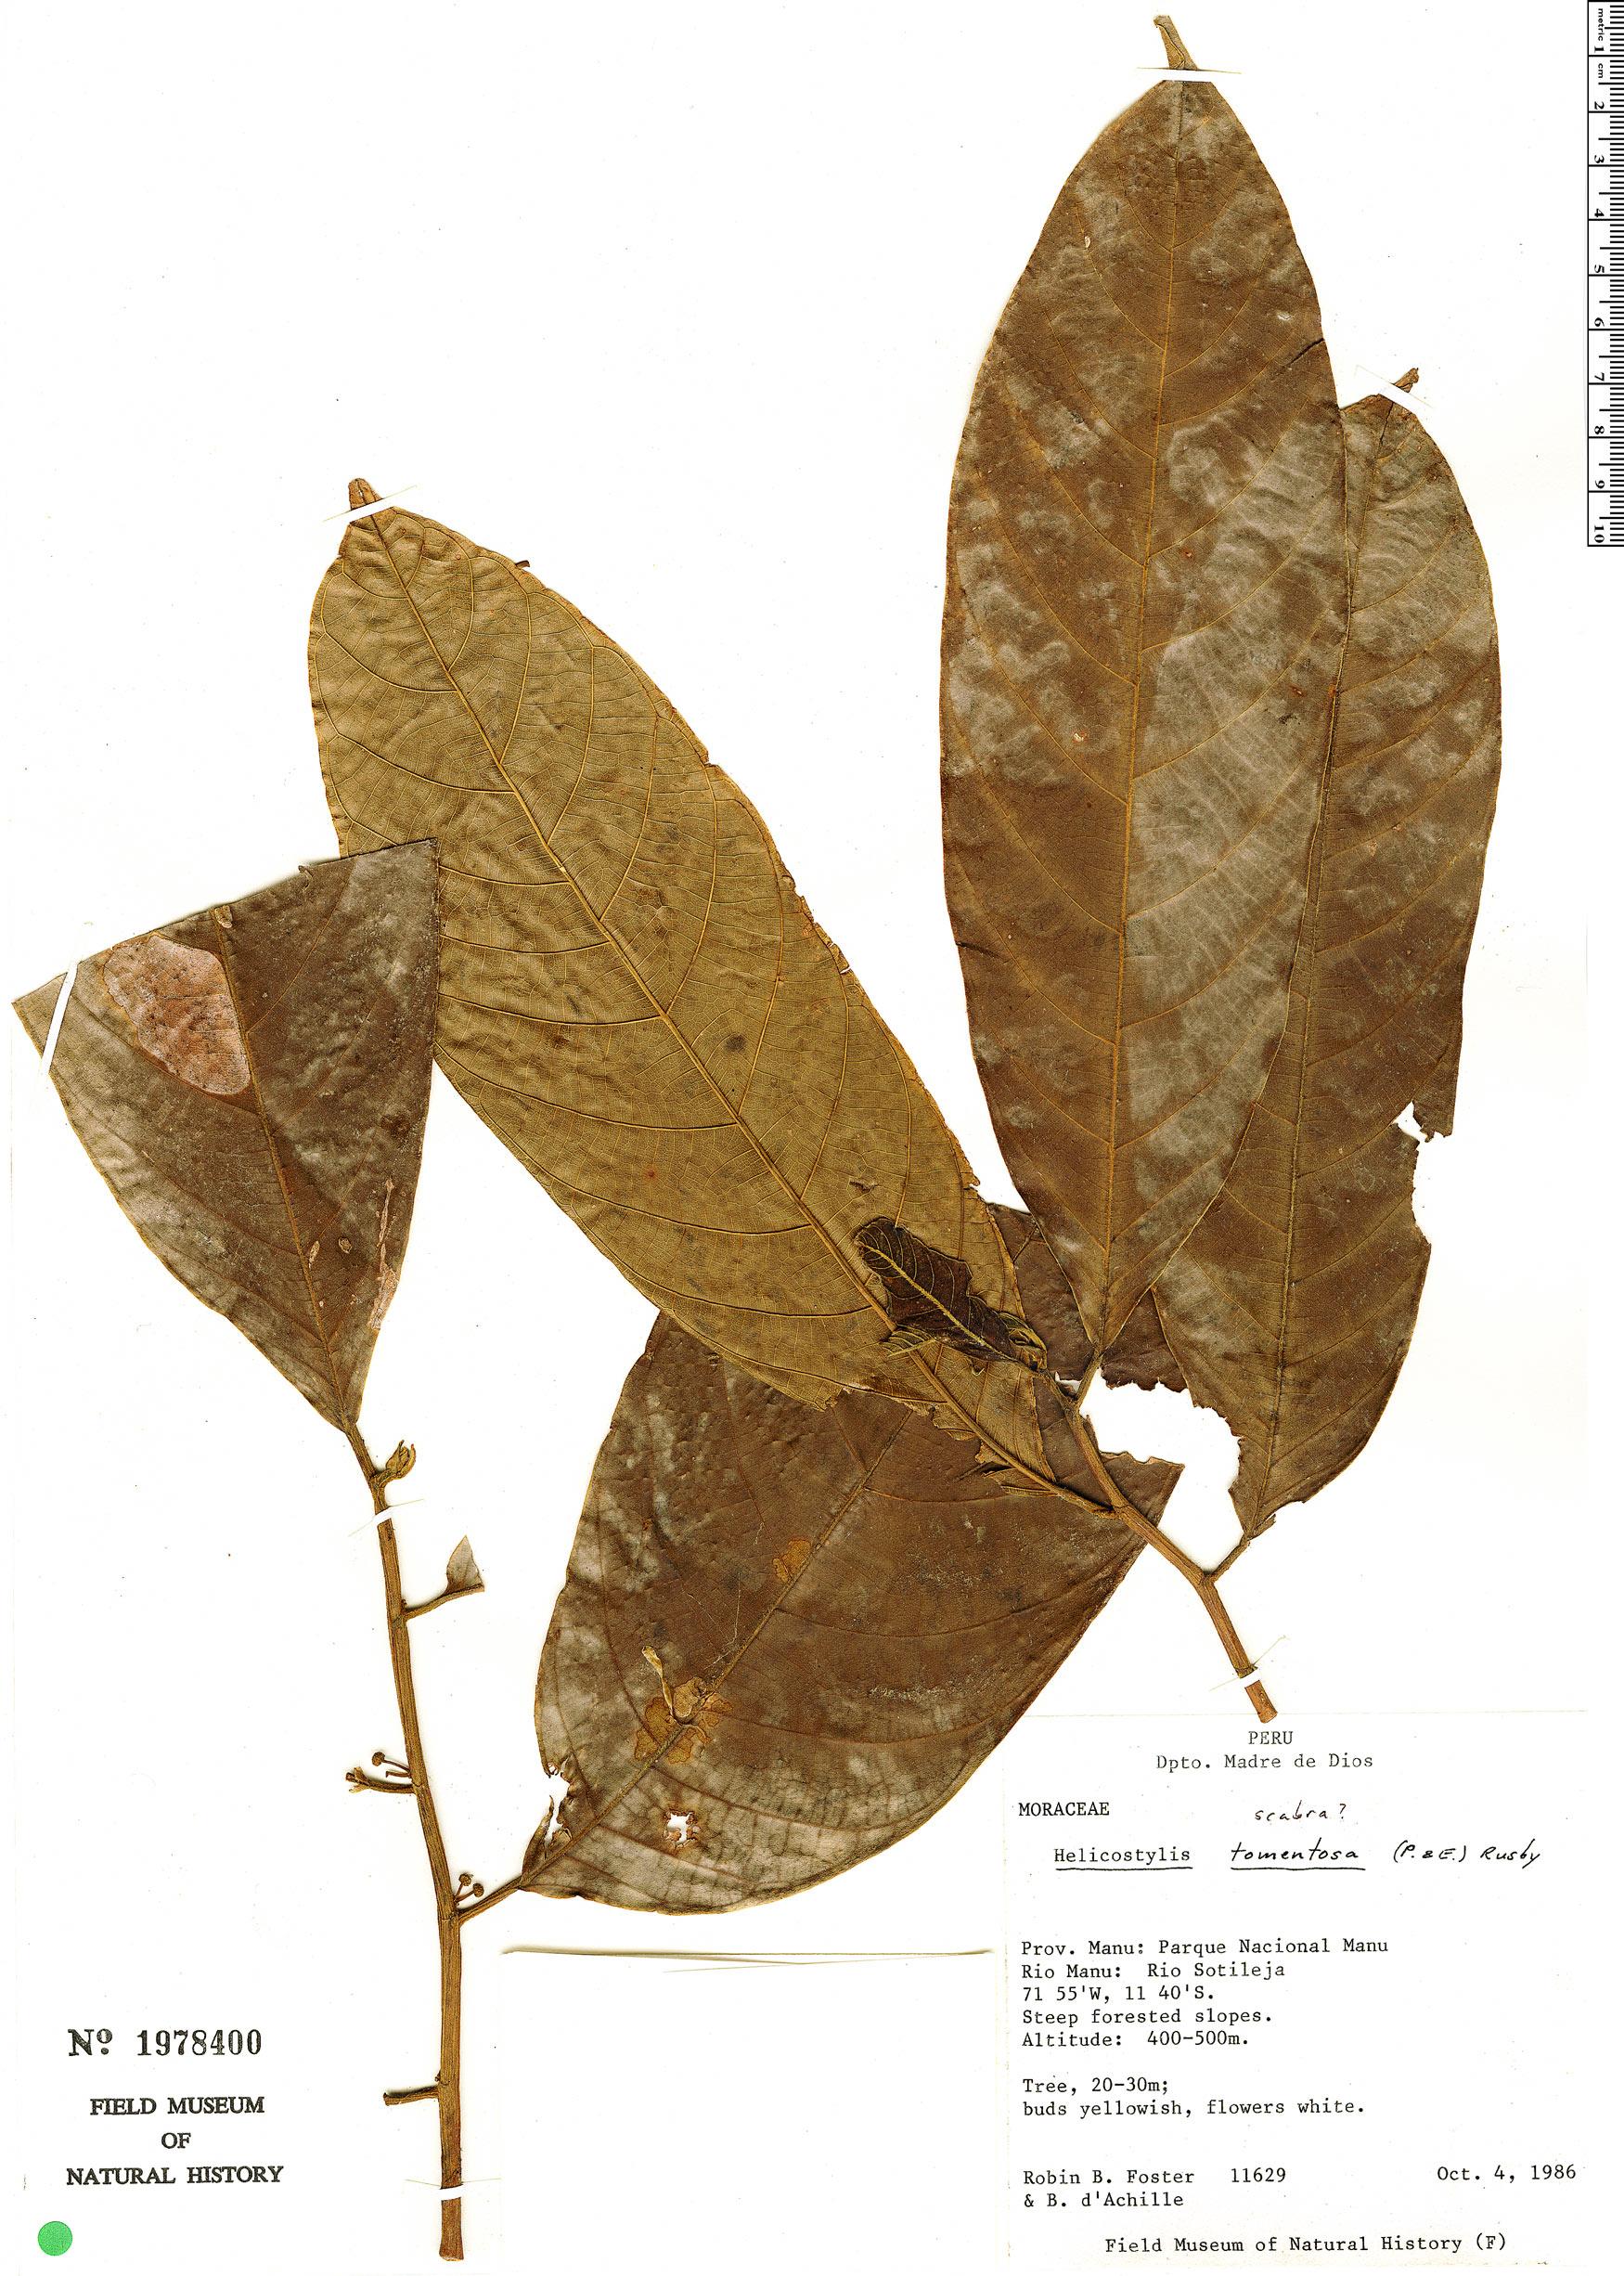 Espécime: Helicostylis tomentosa